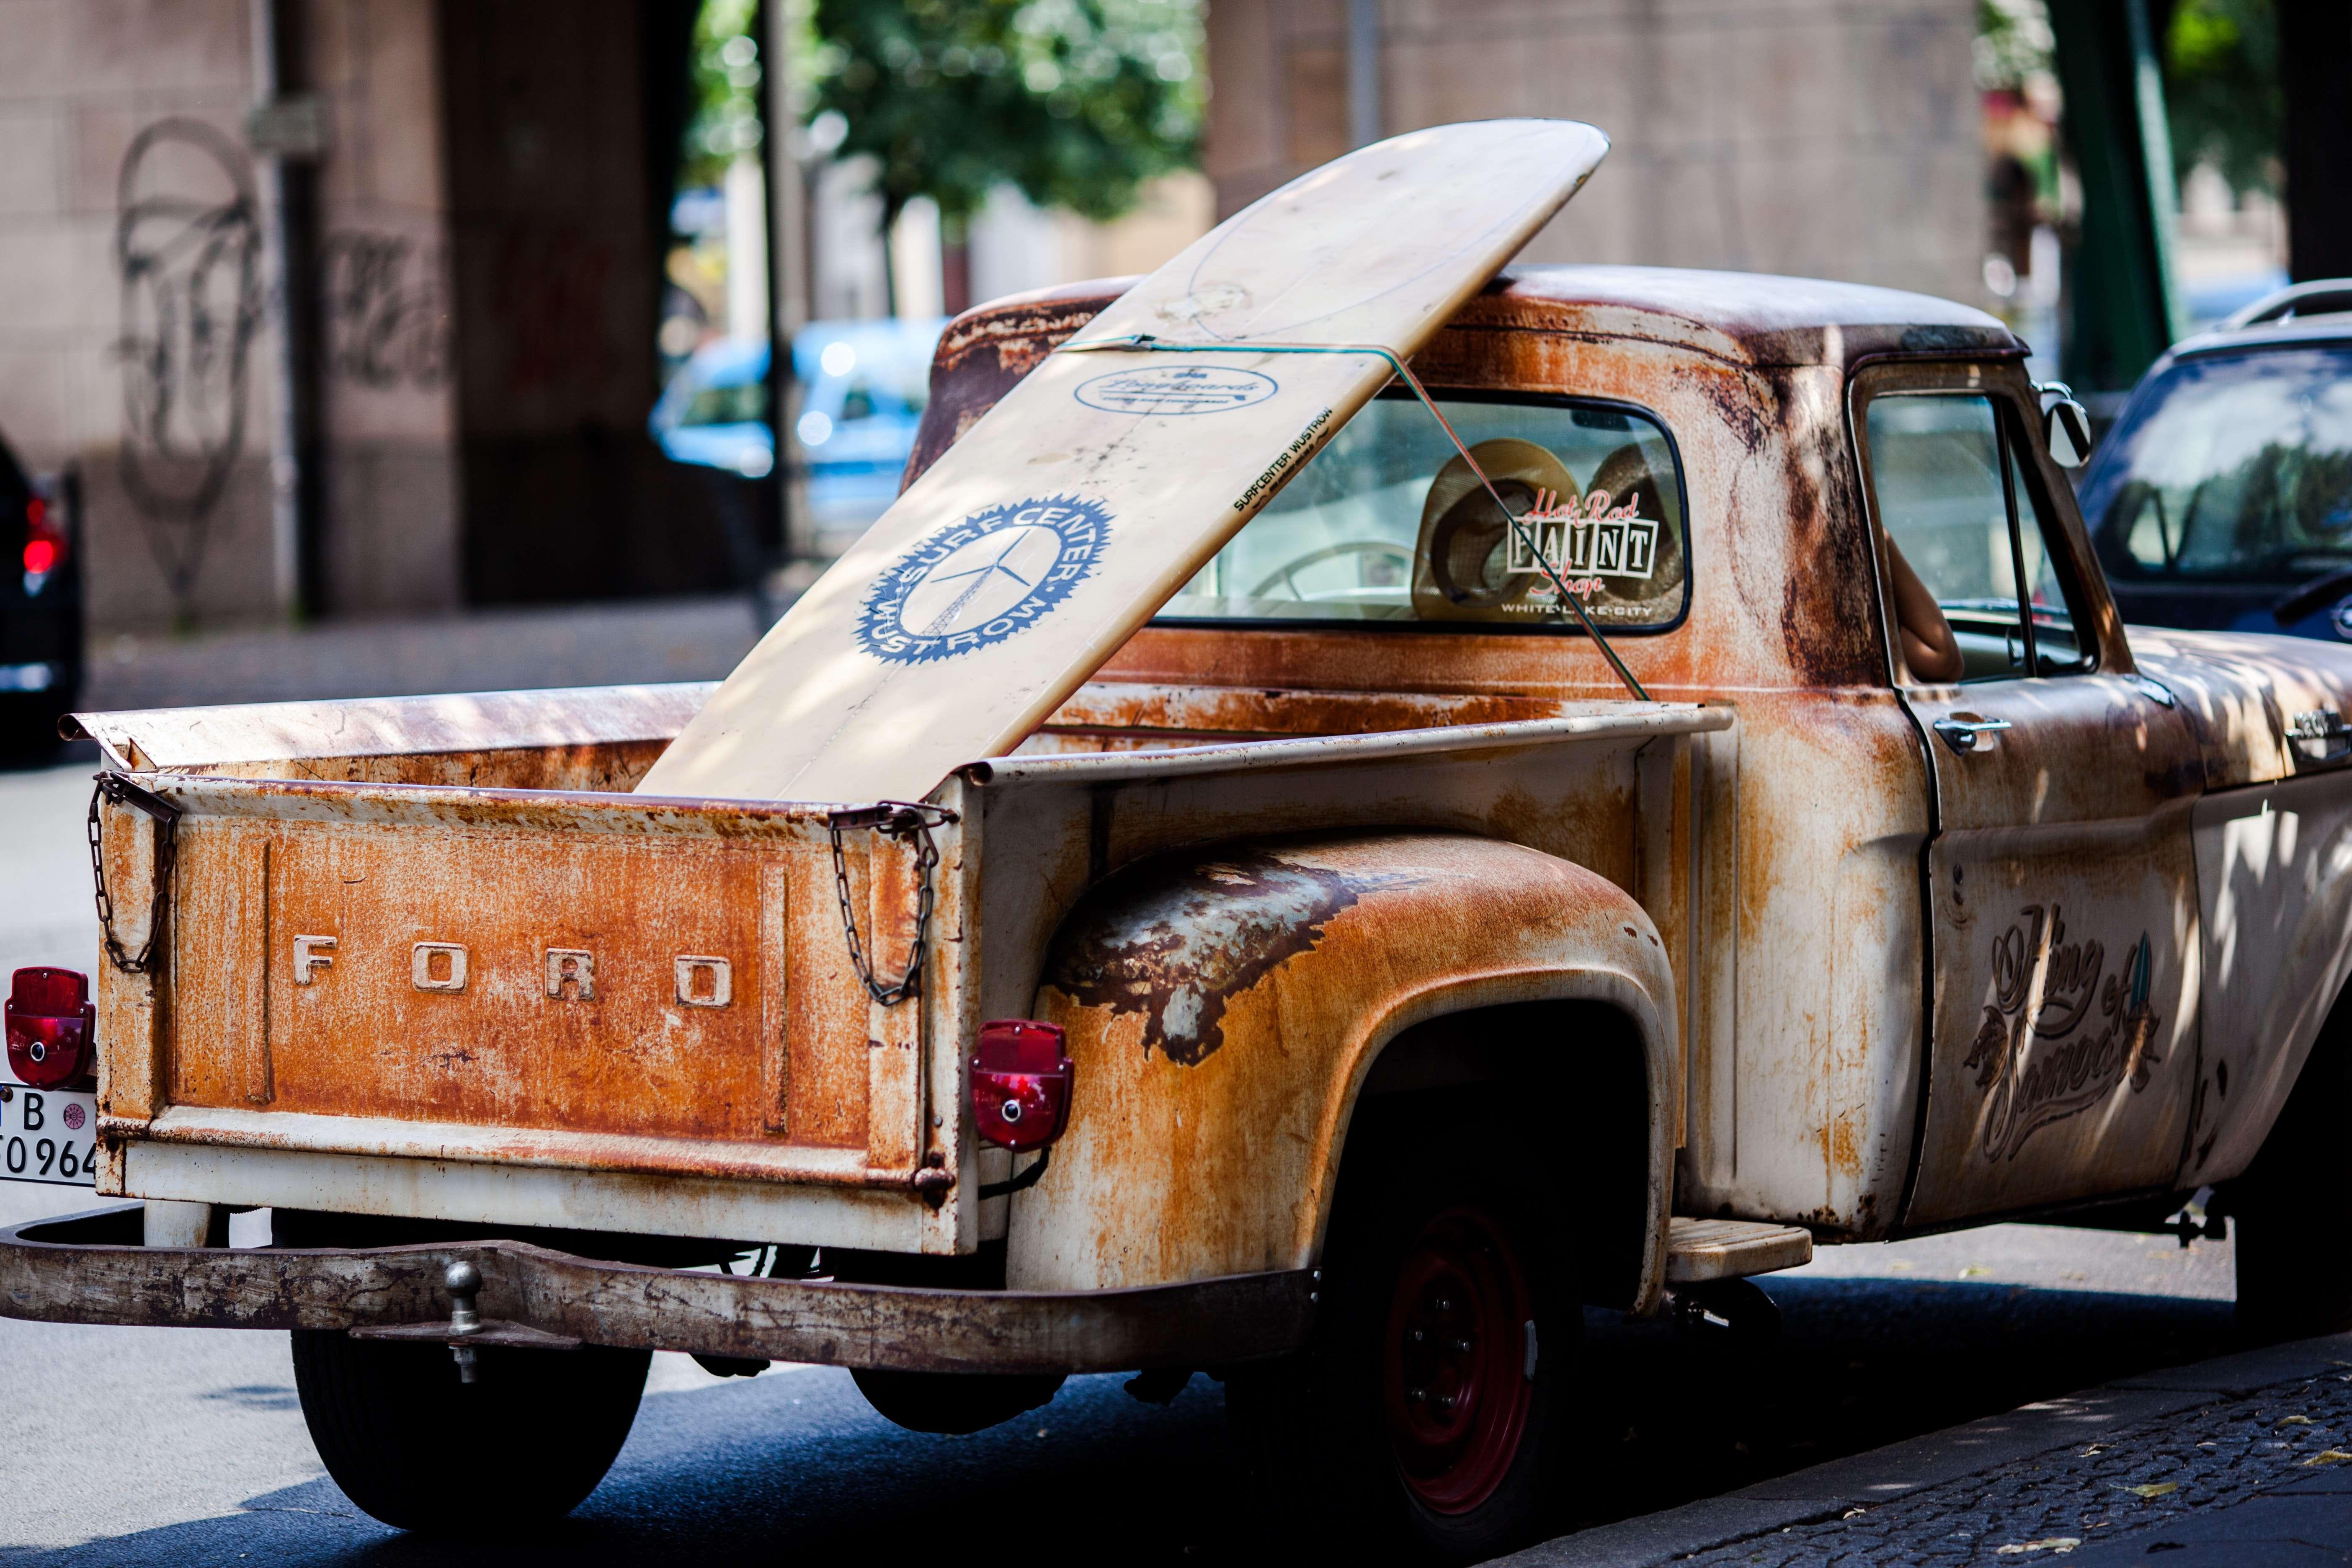 surfboard-in-car